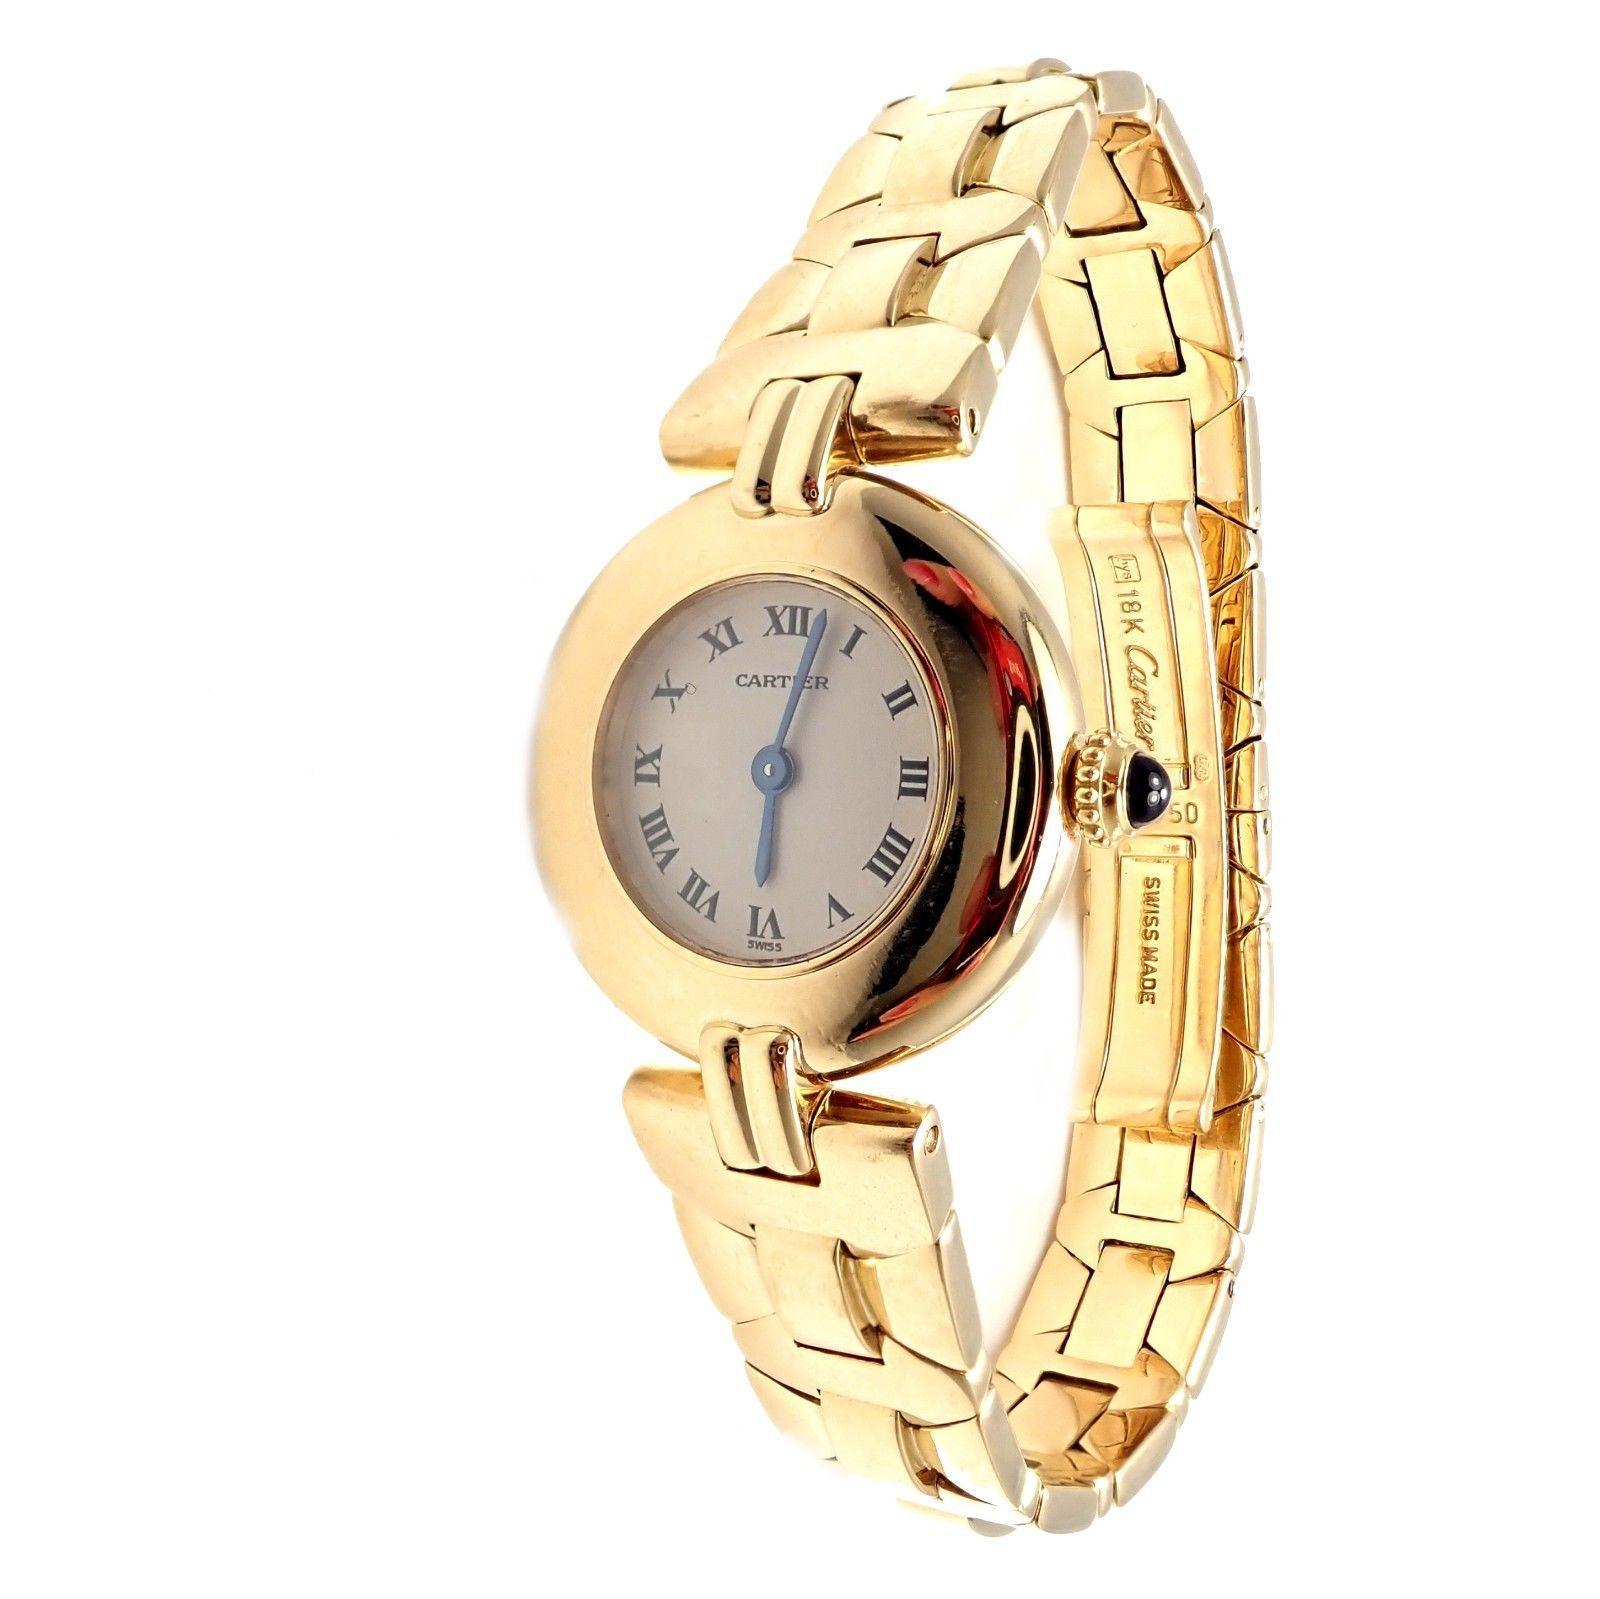 Cartier Paris Rivoli Ladies Quartz Yellow Gold Watch